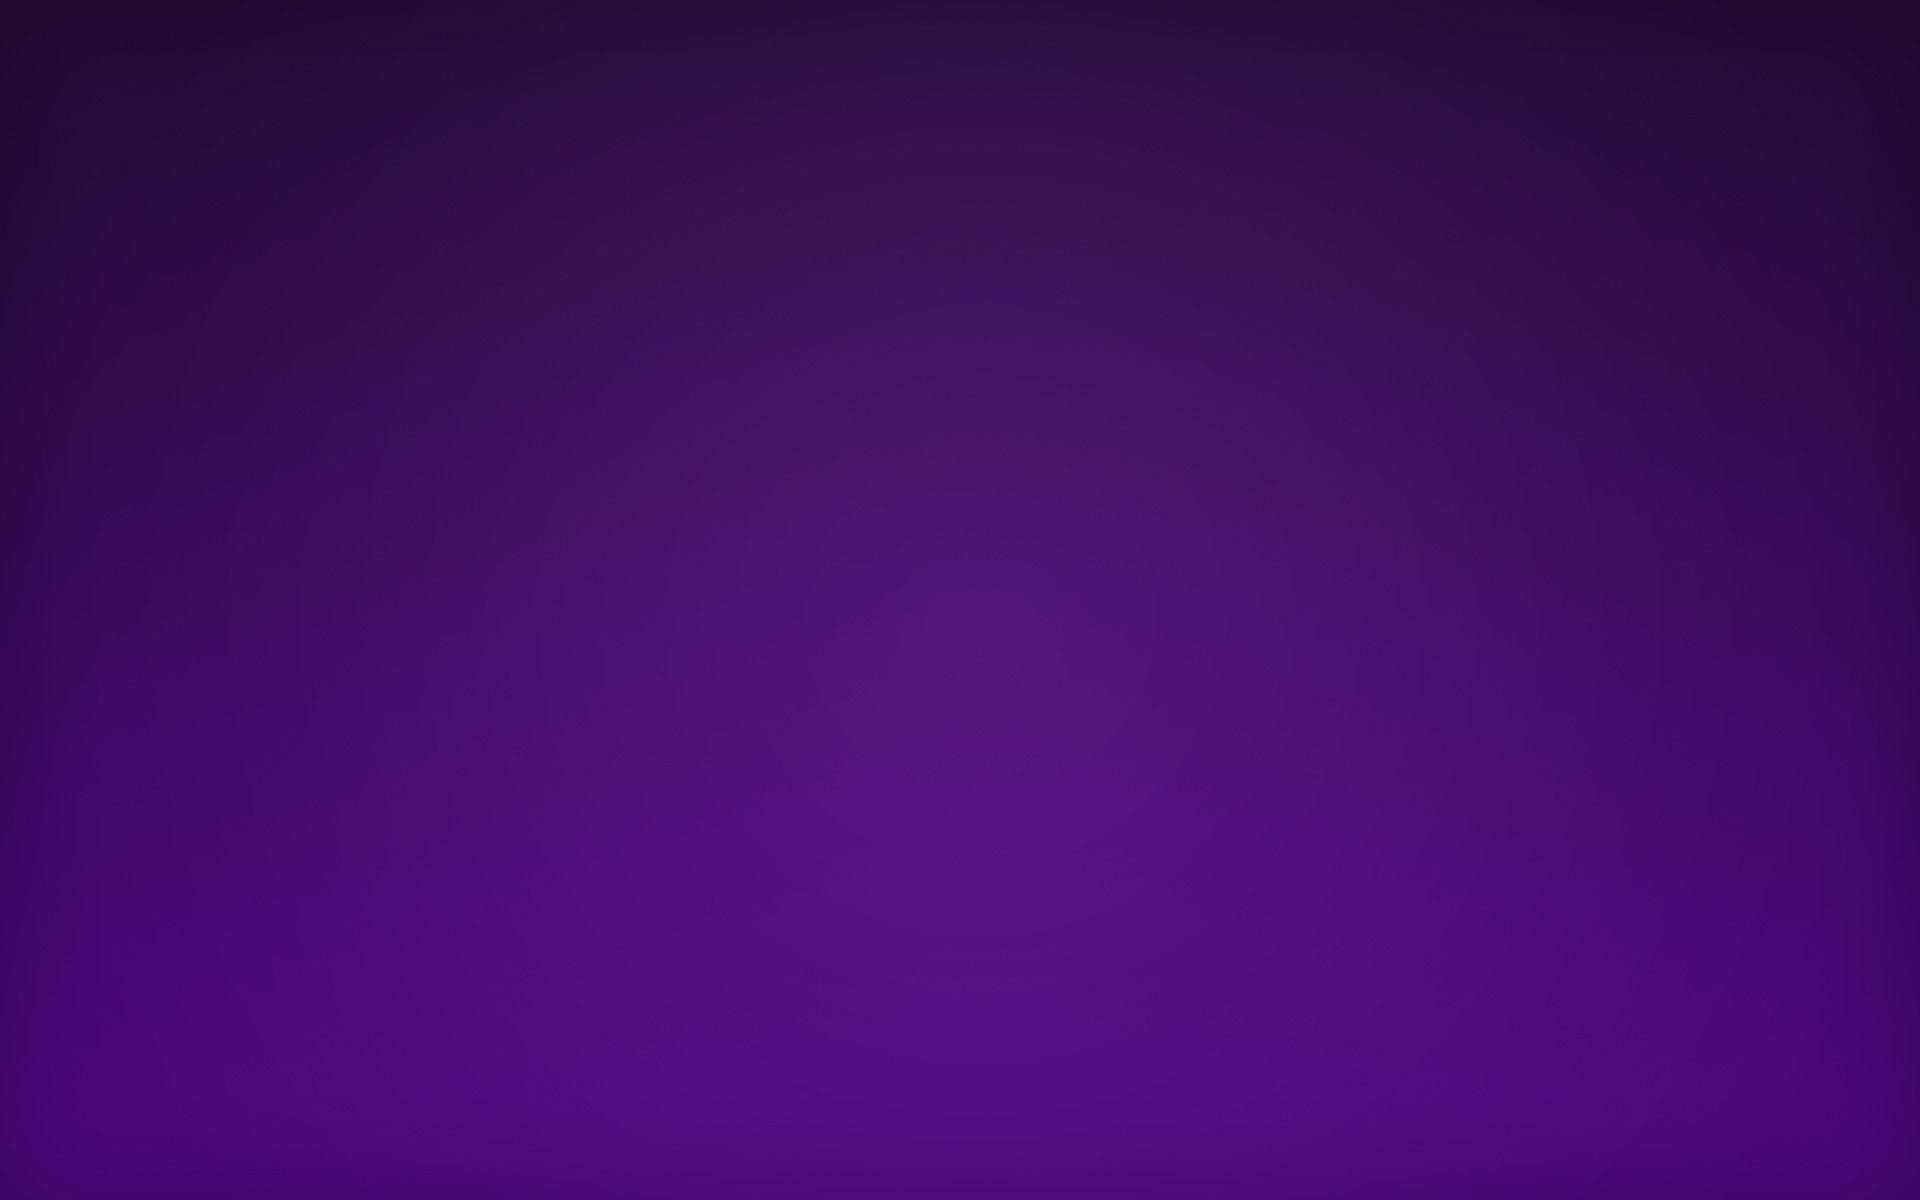 Purple Wallpaper For Phones: Dark Purple Backgrounds (59+ Images